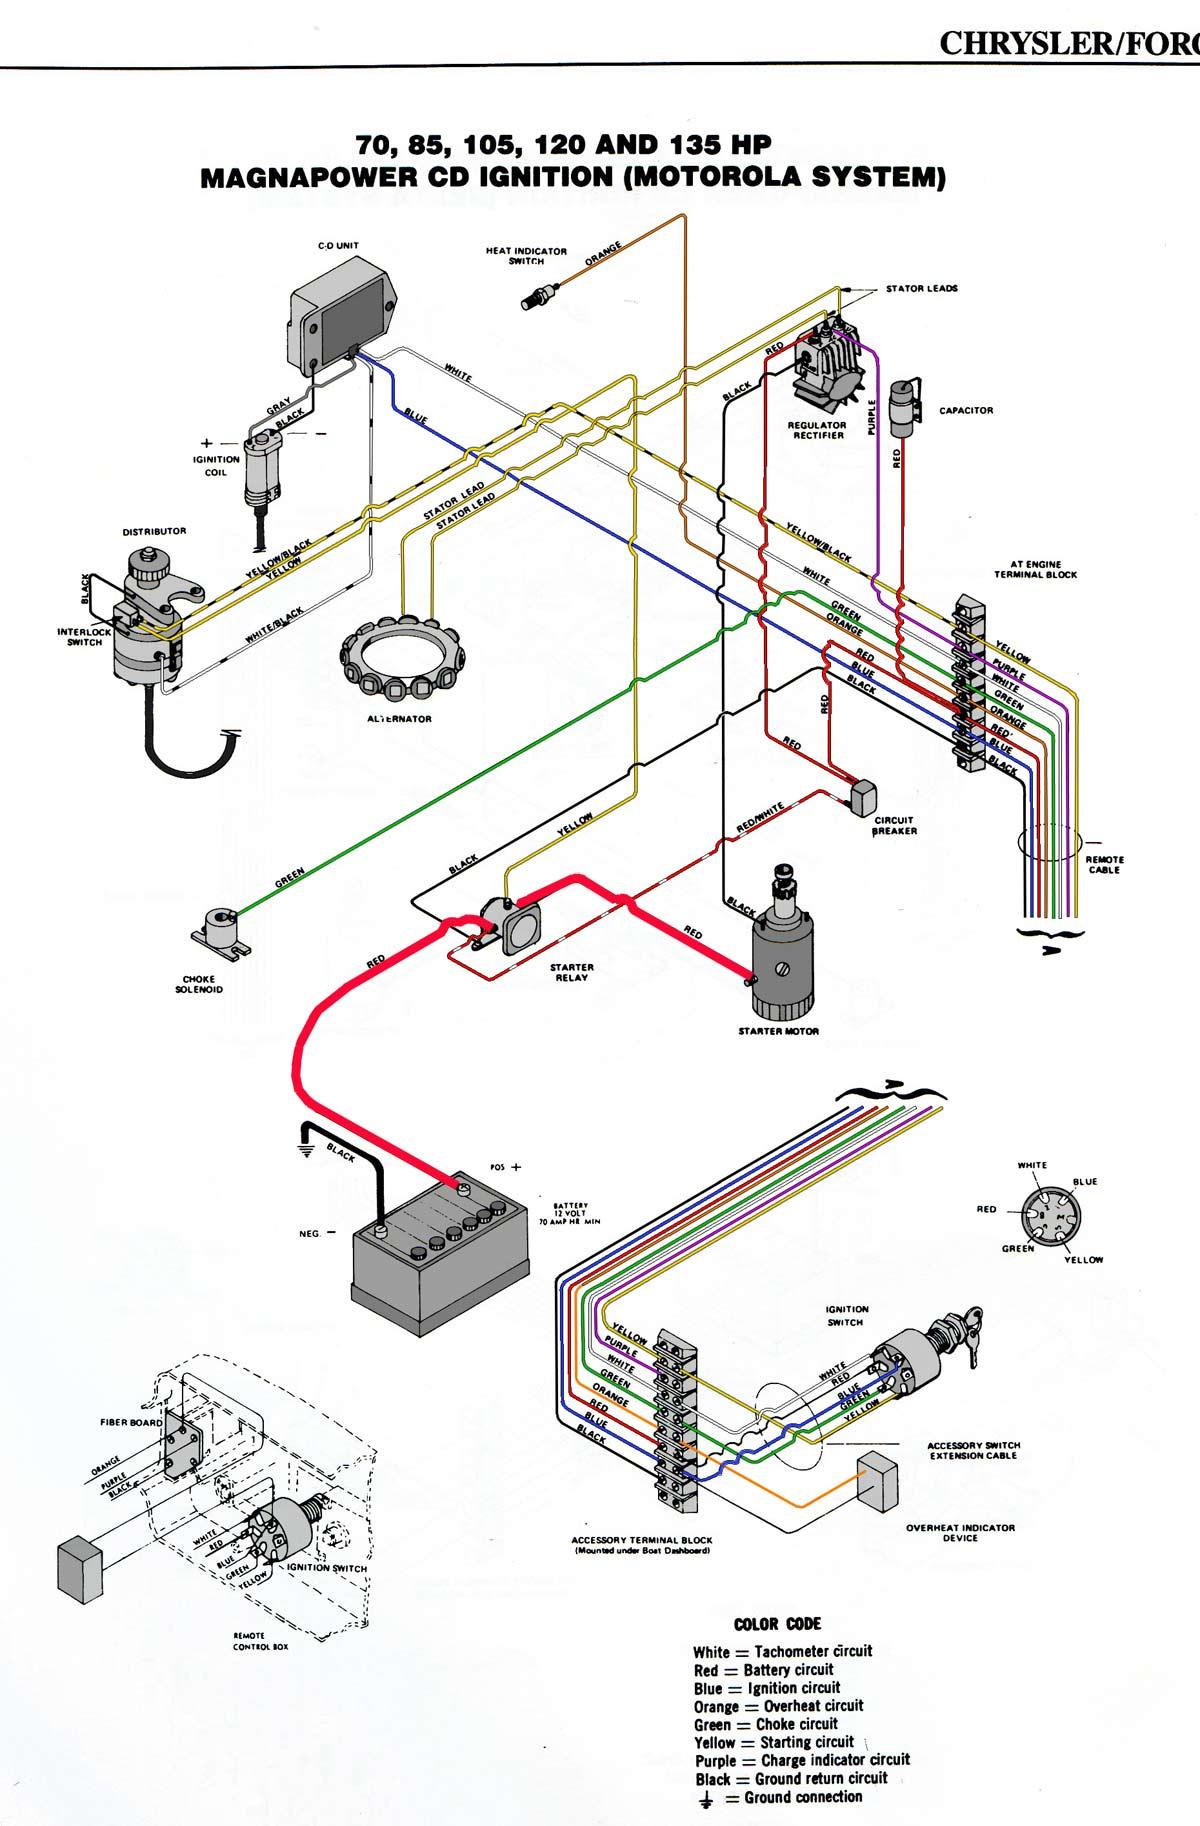 1987 bayliner capri wiring diagram l14 30p 2 starter best library mastertech marine chrysler force outboard diagrams rh maxrules com 50 hp motor